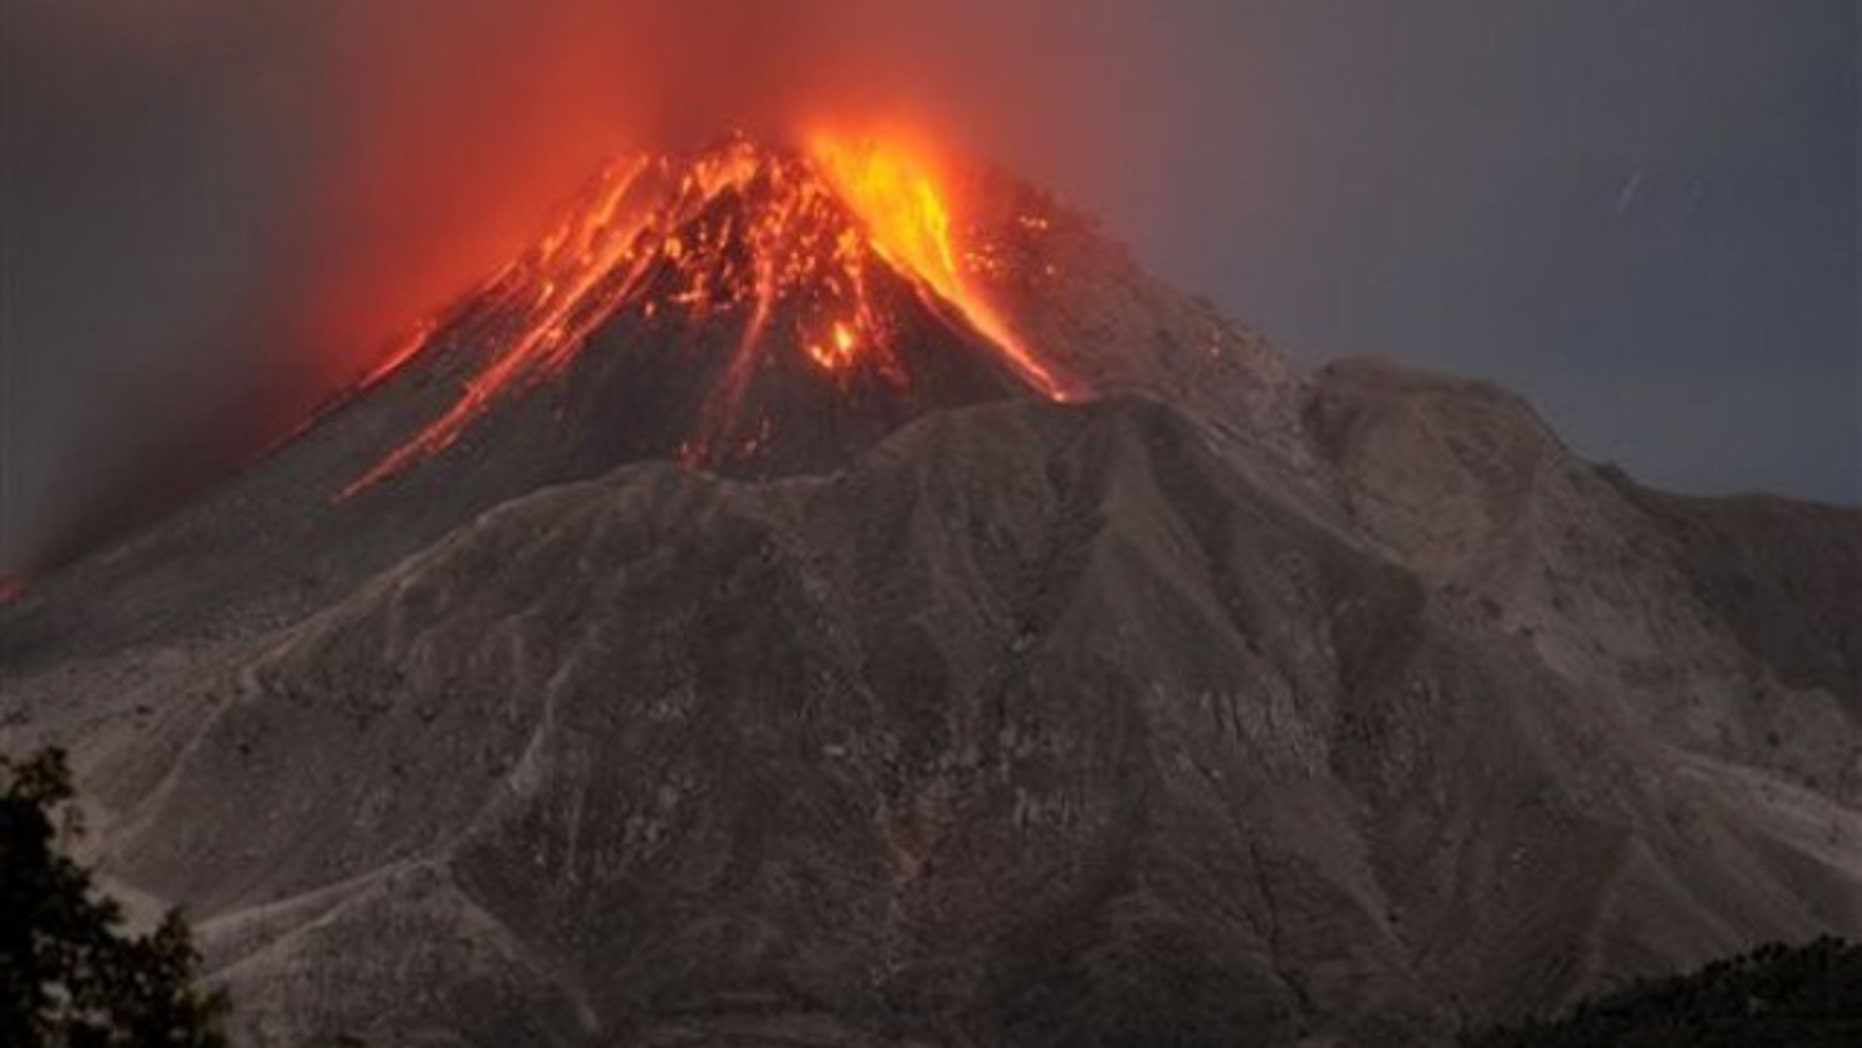 The Soufriere Hills volcano erupts in the Caribbean island of Montserrat, Saturday, Jan. 23, 2010.